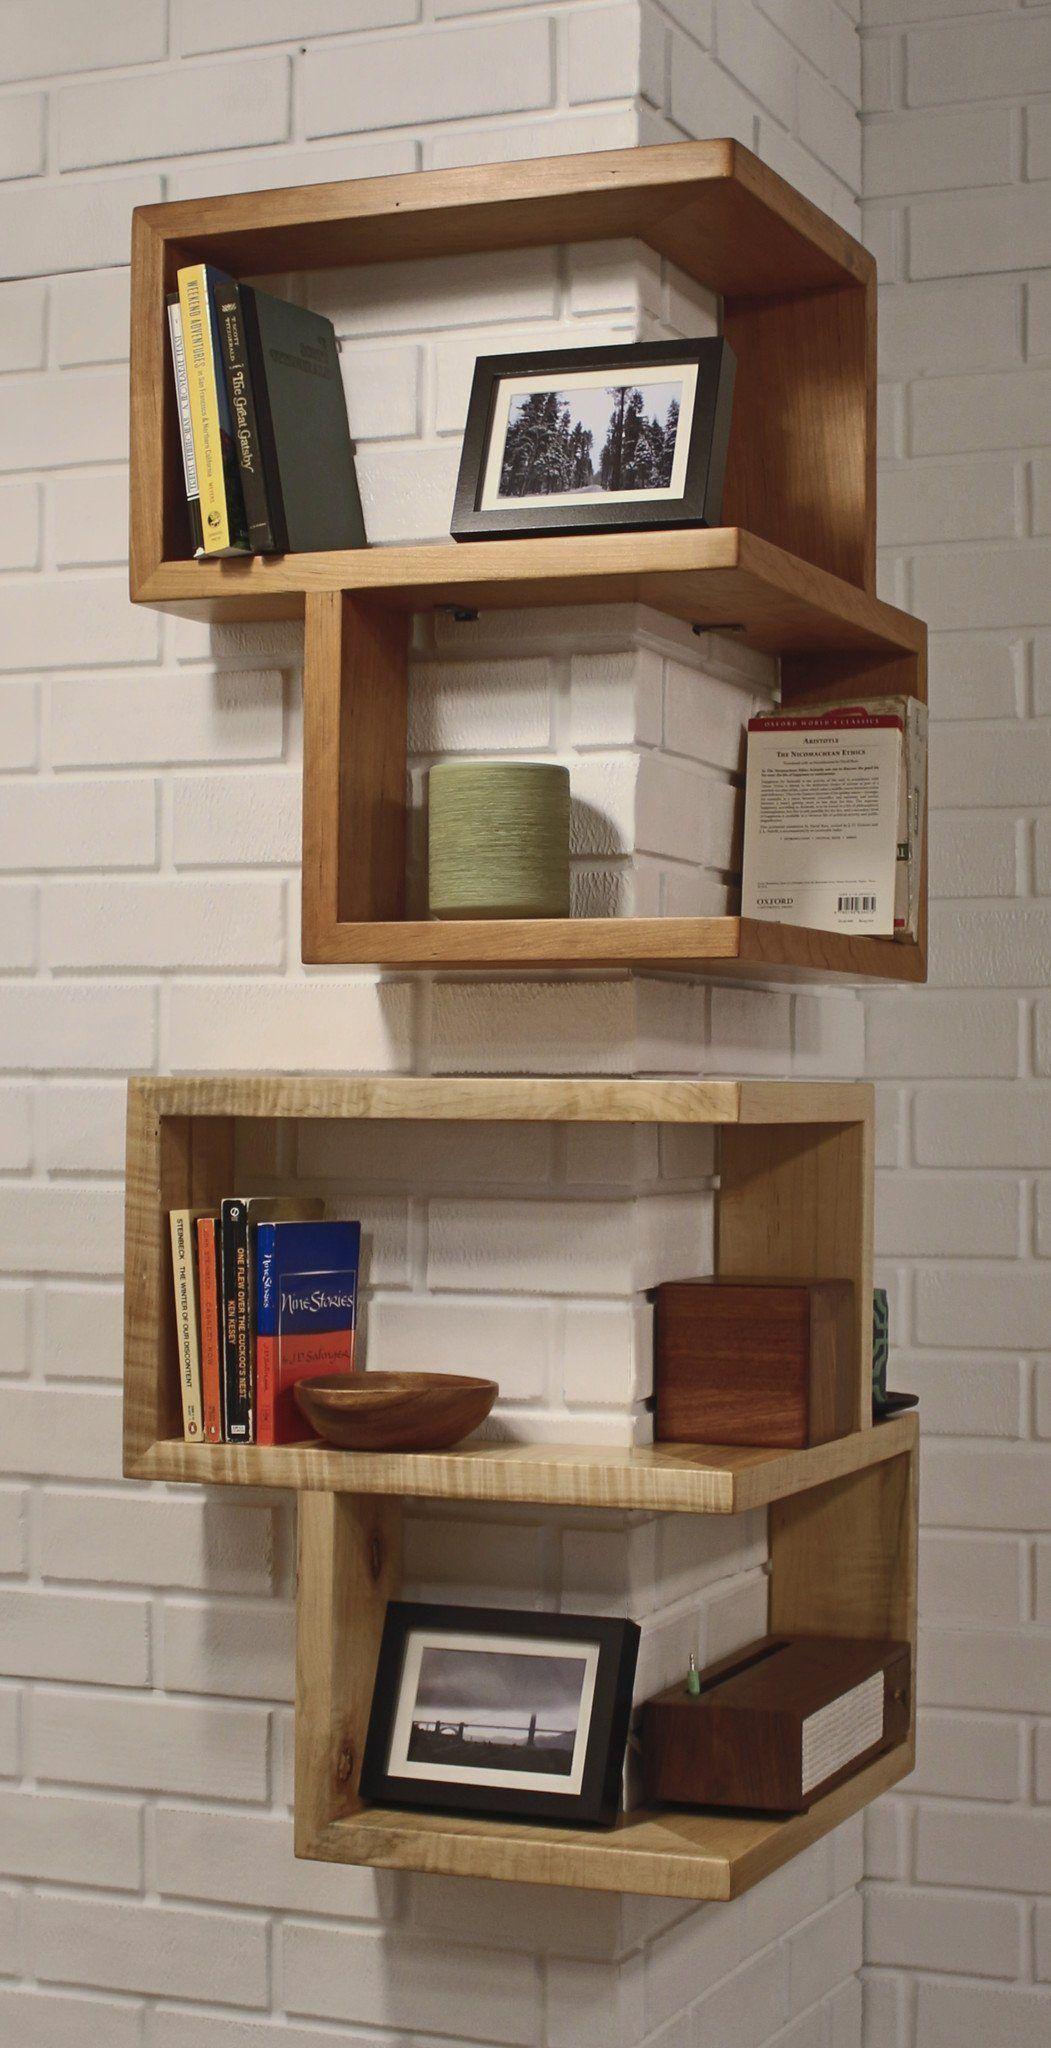 Franklin Shelf Unique Shelves Decorative Small Corner Wall Wooden